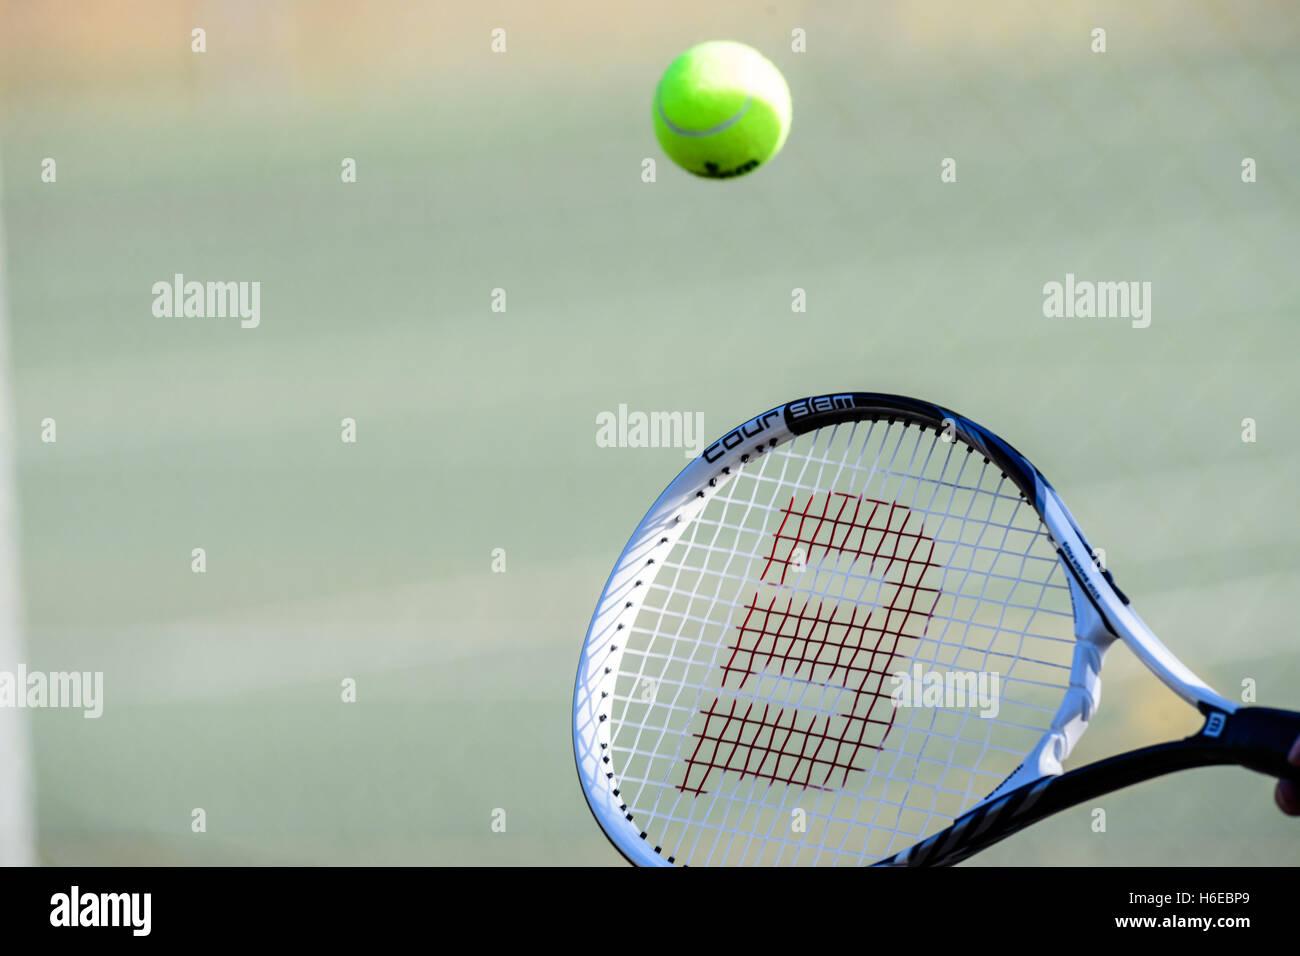 Tennis ball hitting a racket - Stock Image